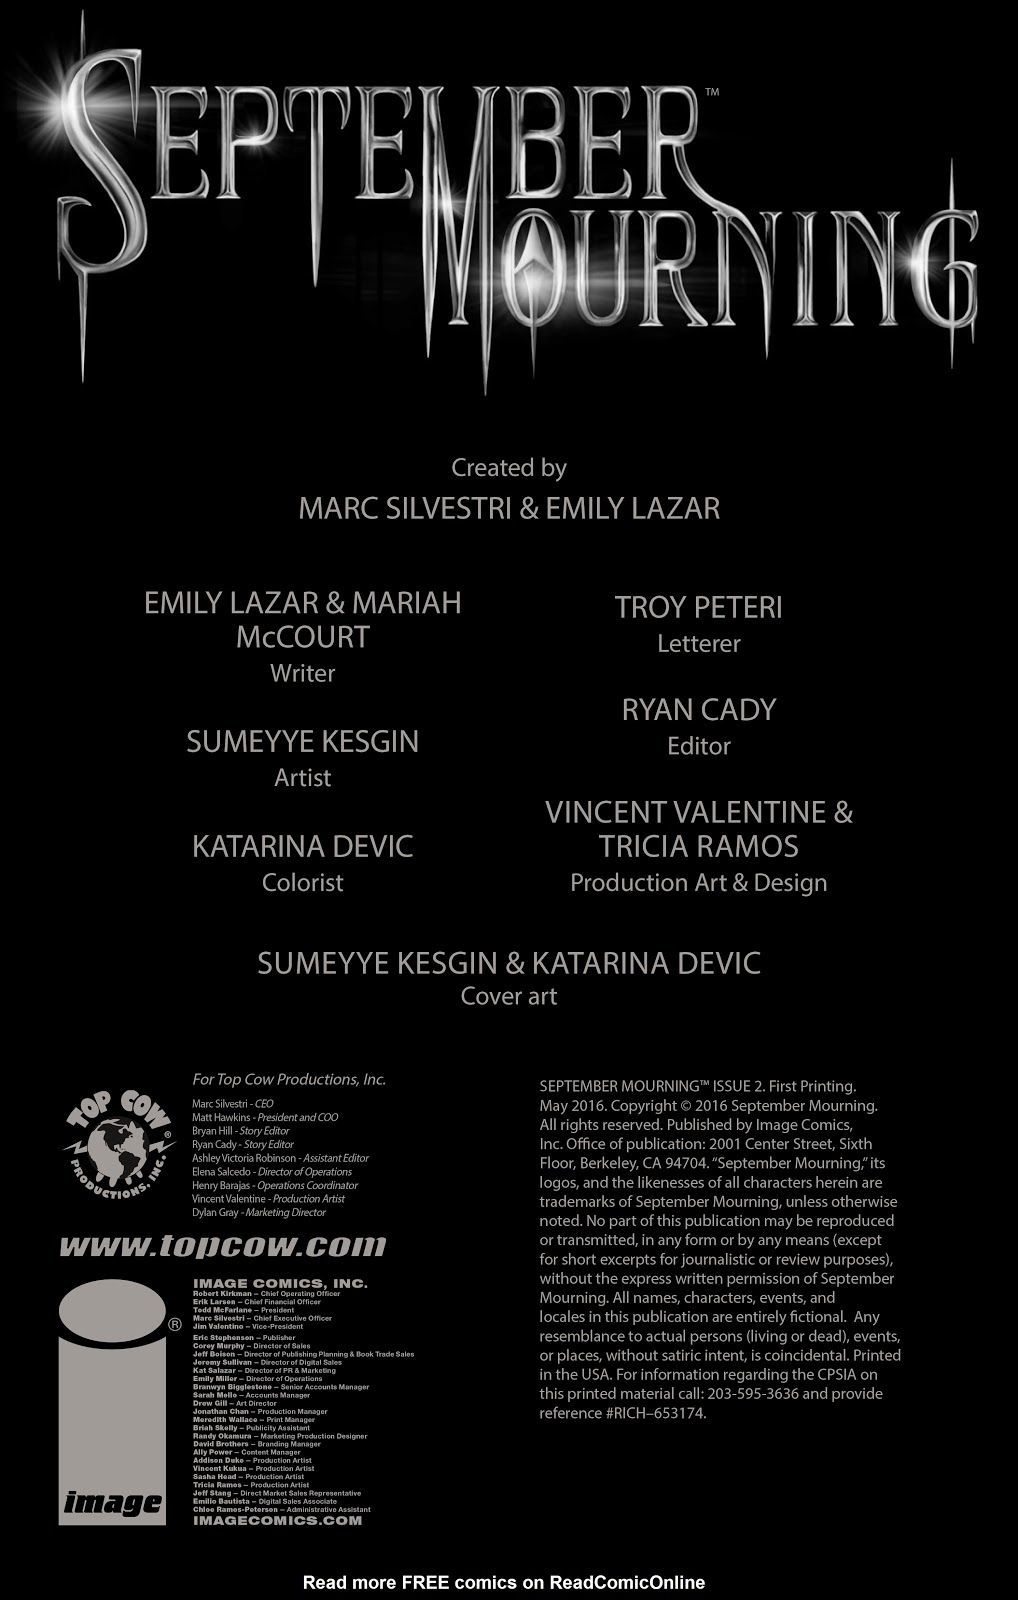 Read online September Mourning Volume 1 comic -  Issue #2 - 4